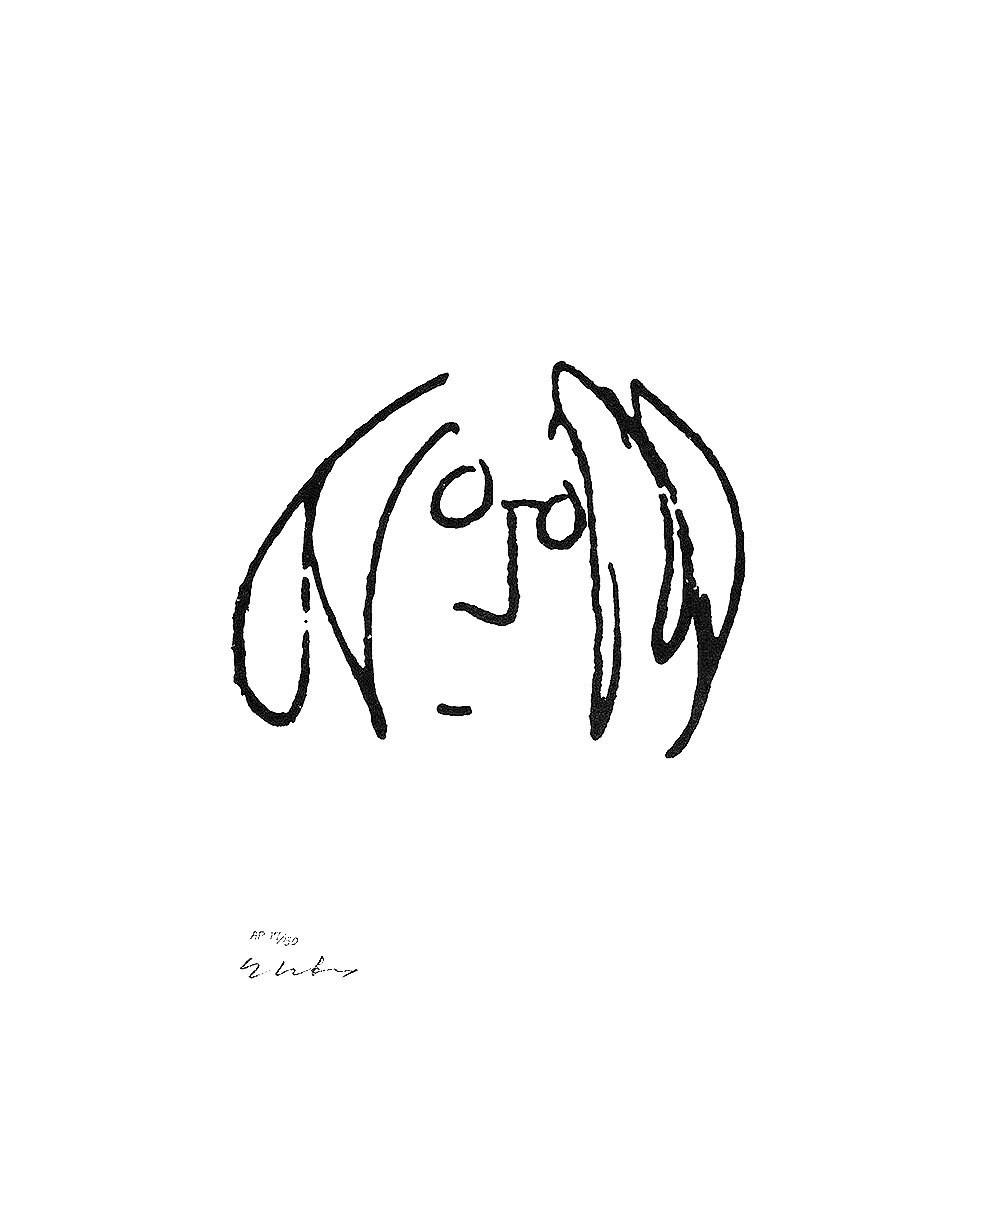 1000x1216 John Lennon Archives A U T O R I T R A T T I